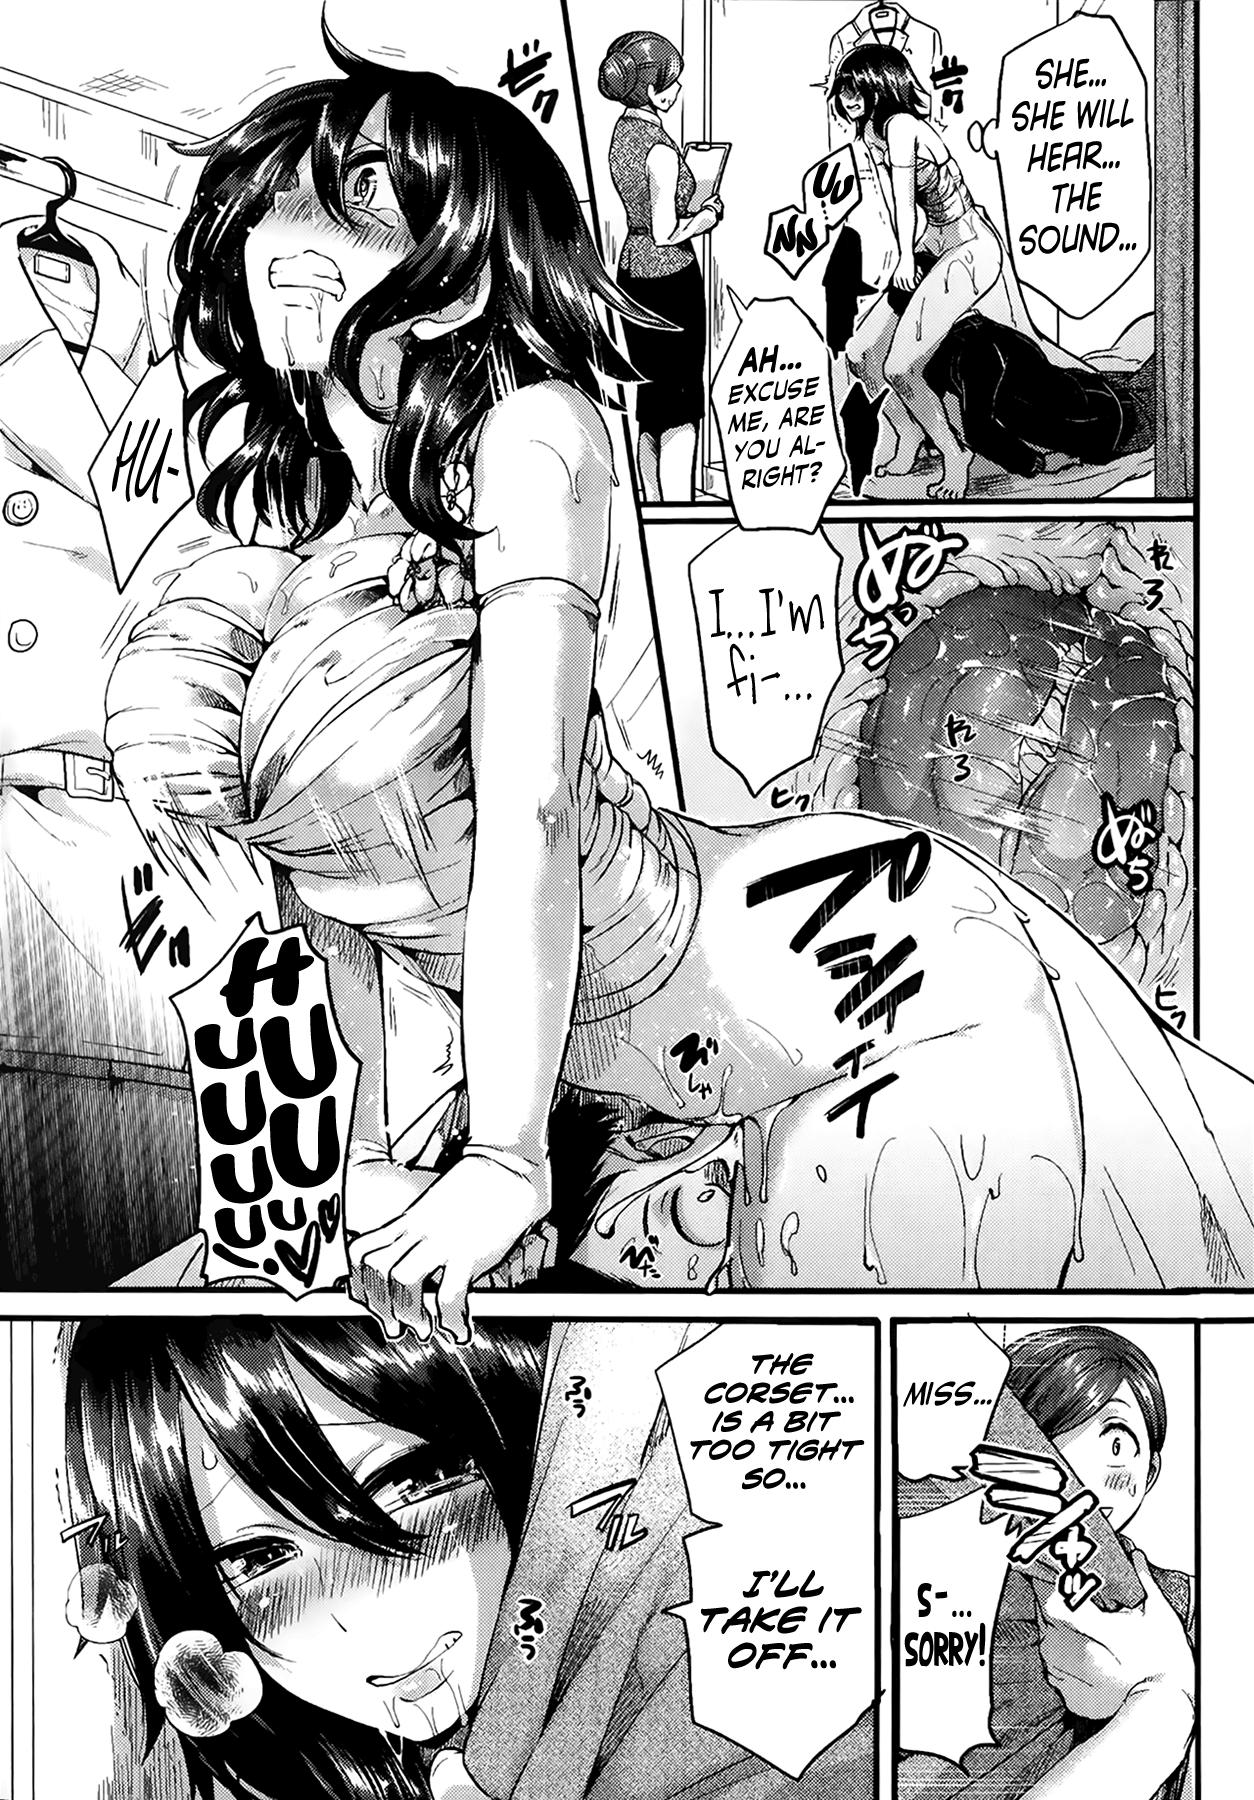 [Doumou] Suki Suki! Onee-chan + Bridal Chapter + -after story- [English] [Life4Kaoru] 33